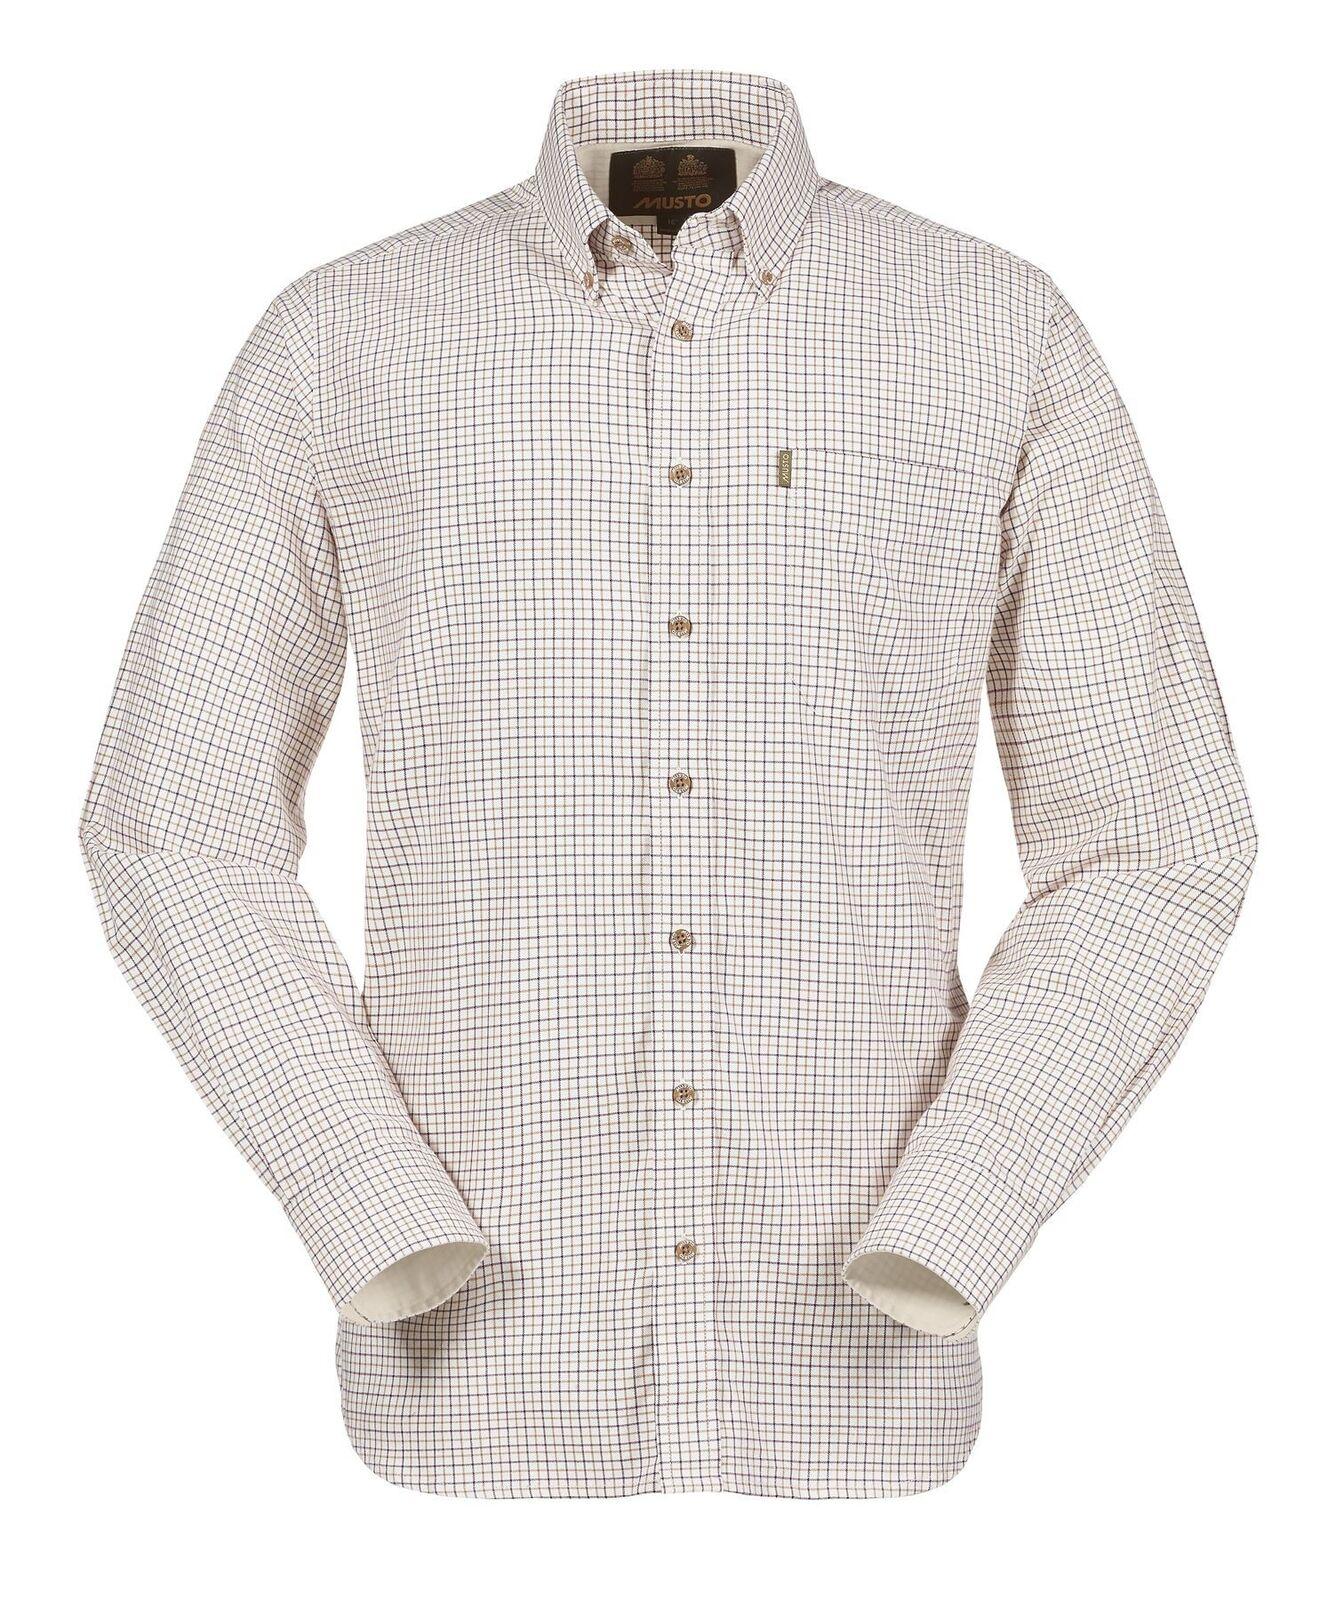 Musto Classic Button Down Shirt - Gorse